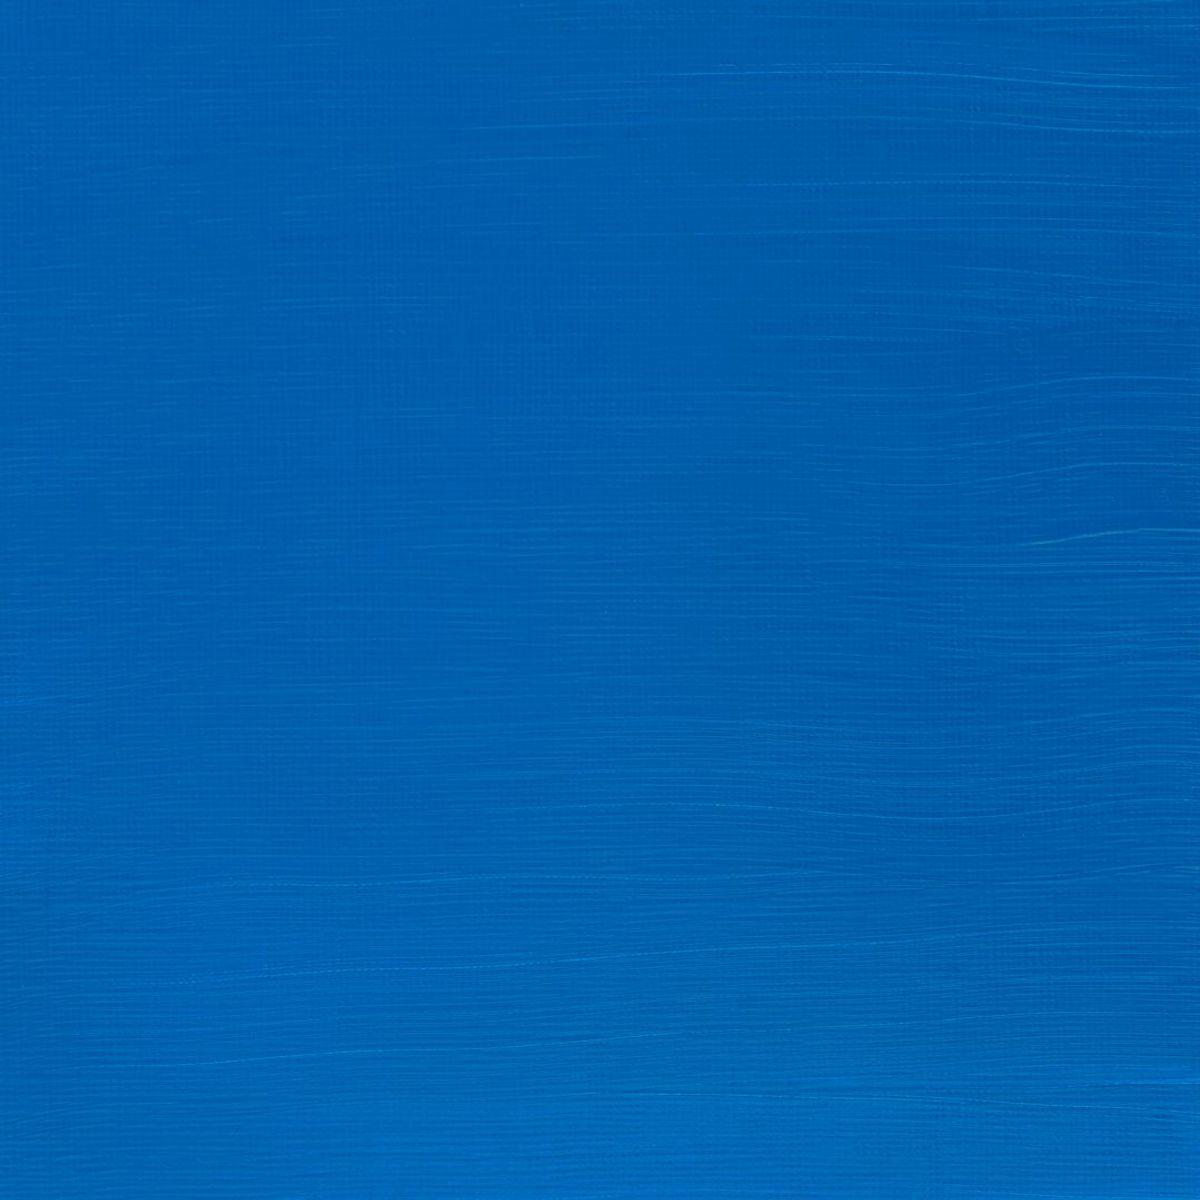 WINSOR AND NEWTON GALERIA ACRYLIC COLOUR - TUBE OF 60 ML - CERULEAN BLUE HUE (138)